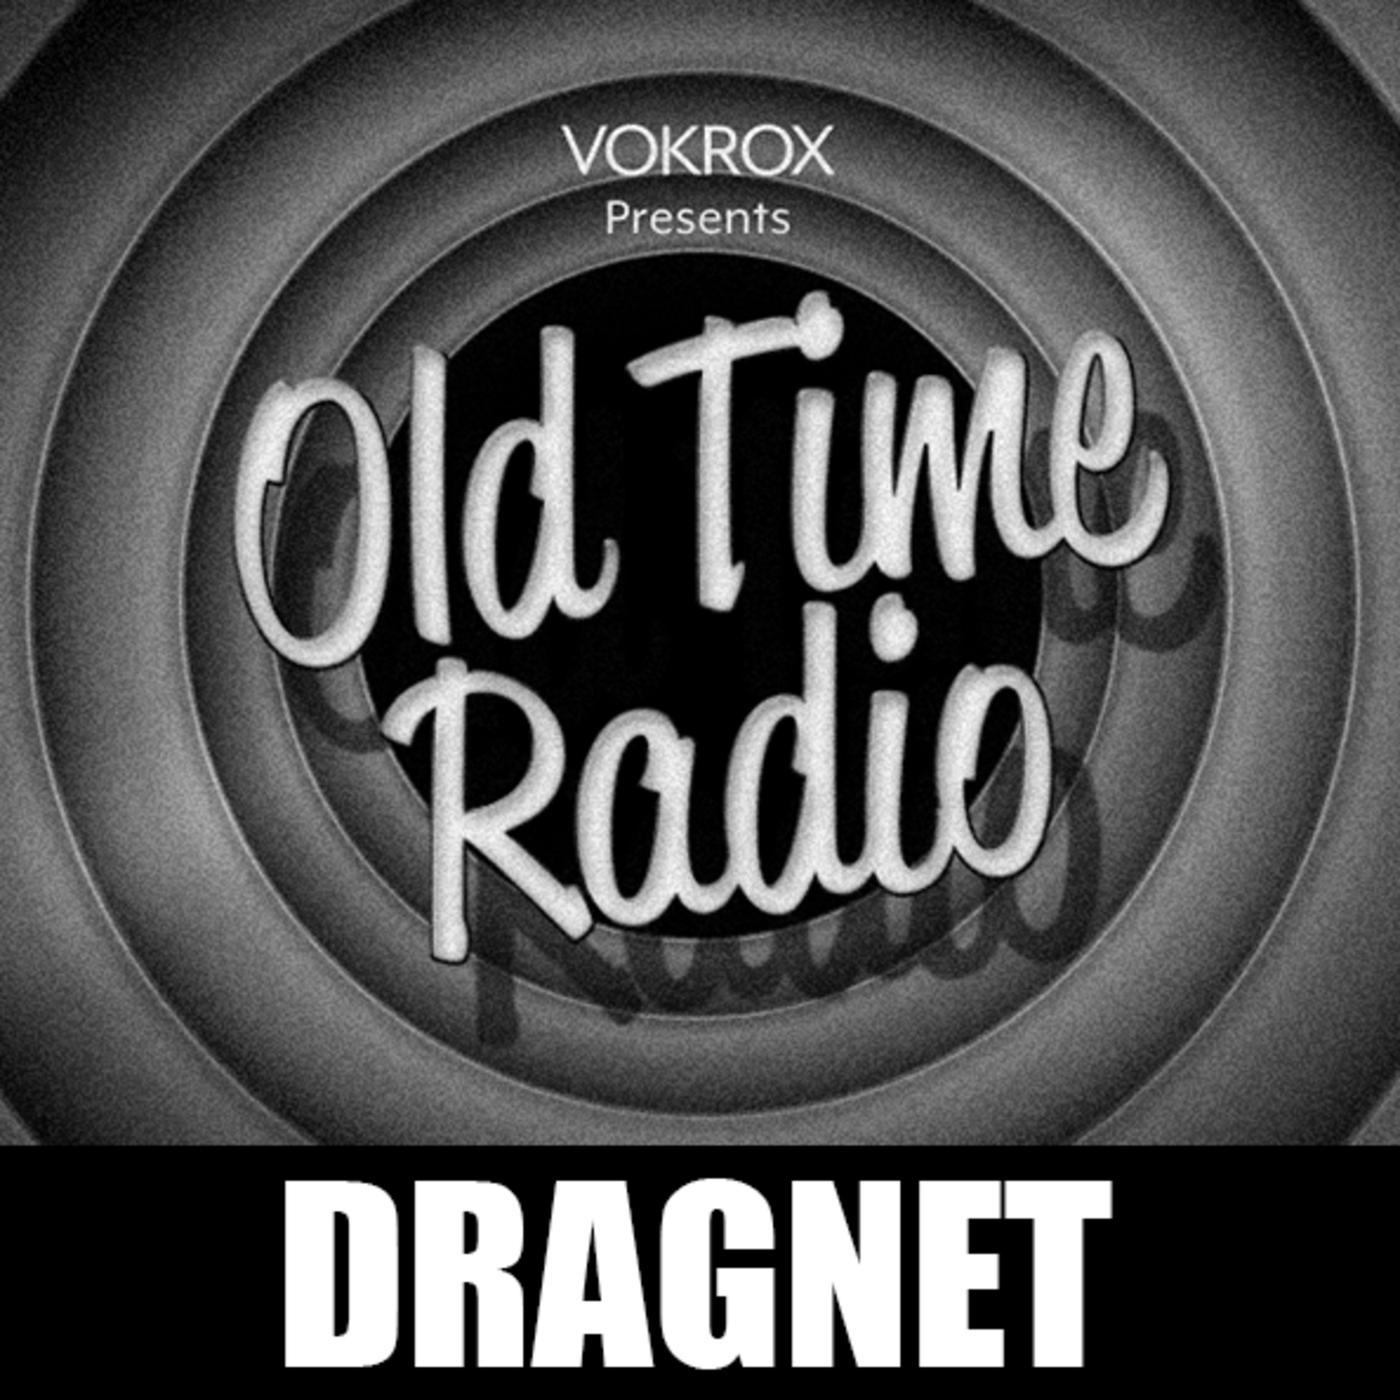 Dragnet | Old Time Radio (podcast) - OTR Podcasts | Listen Notes